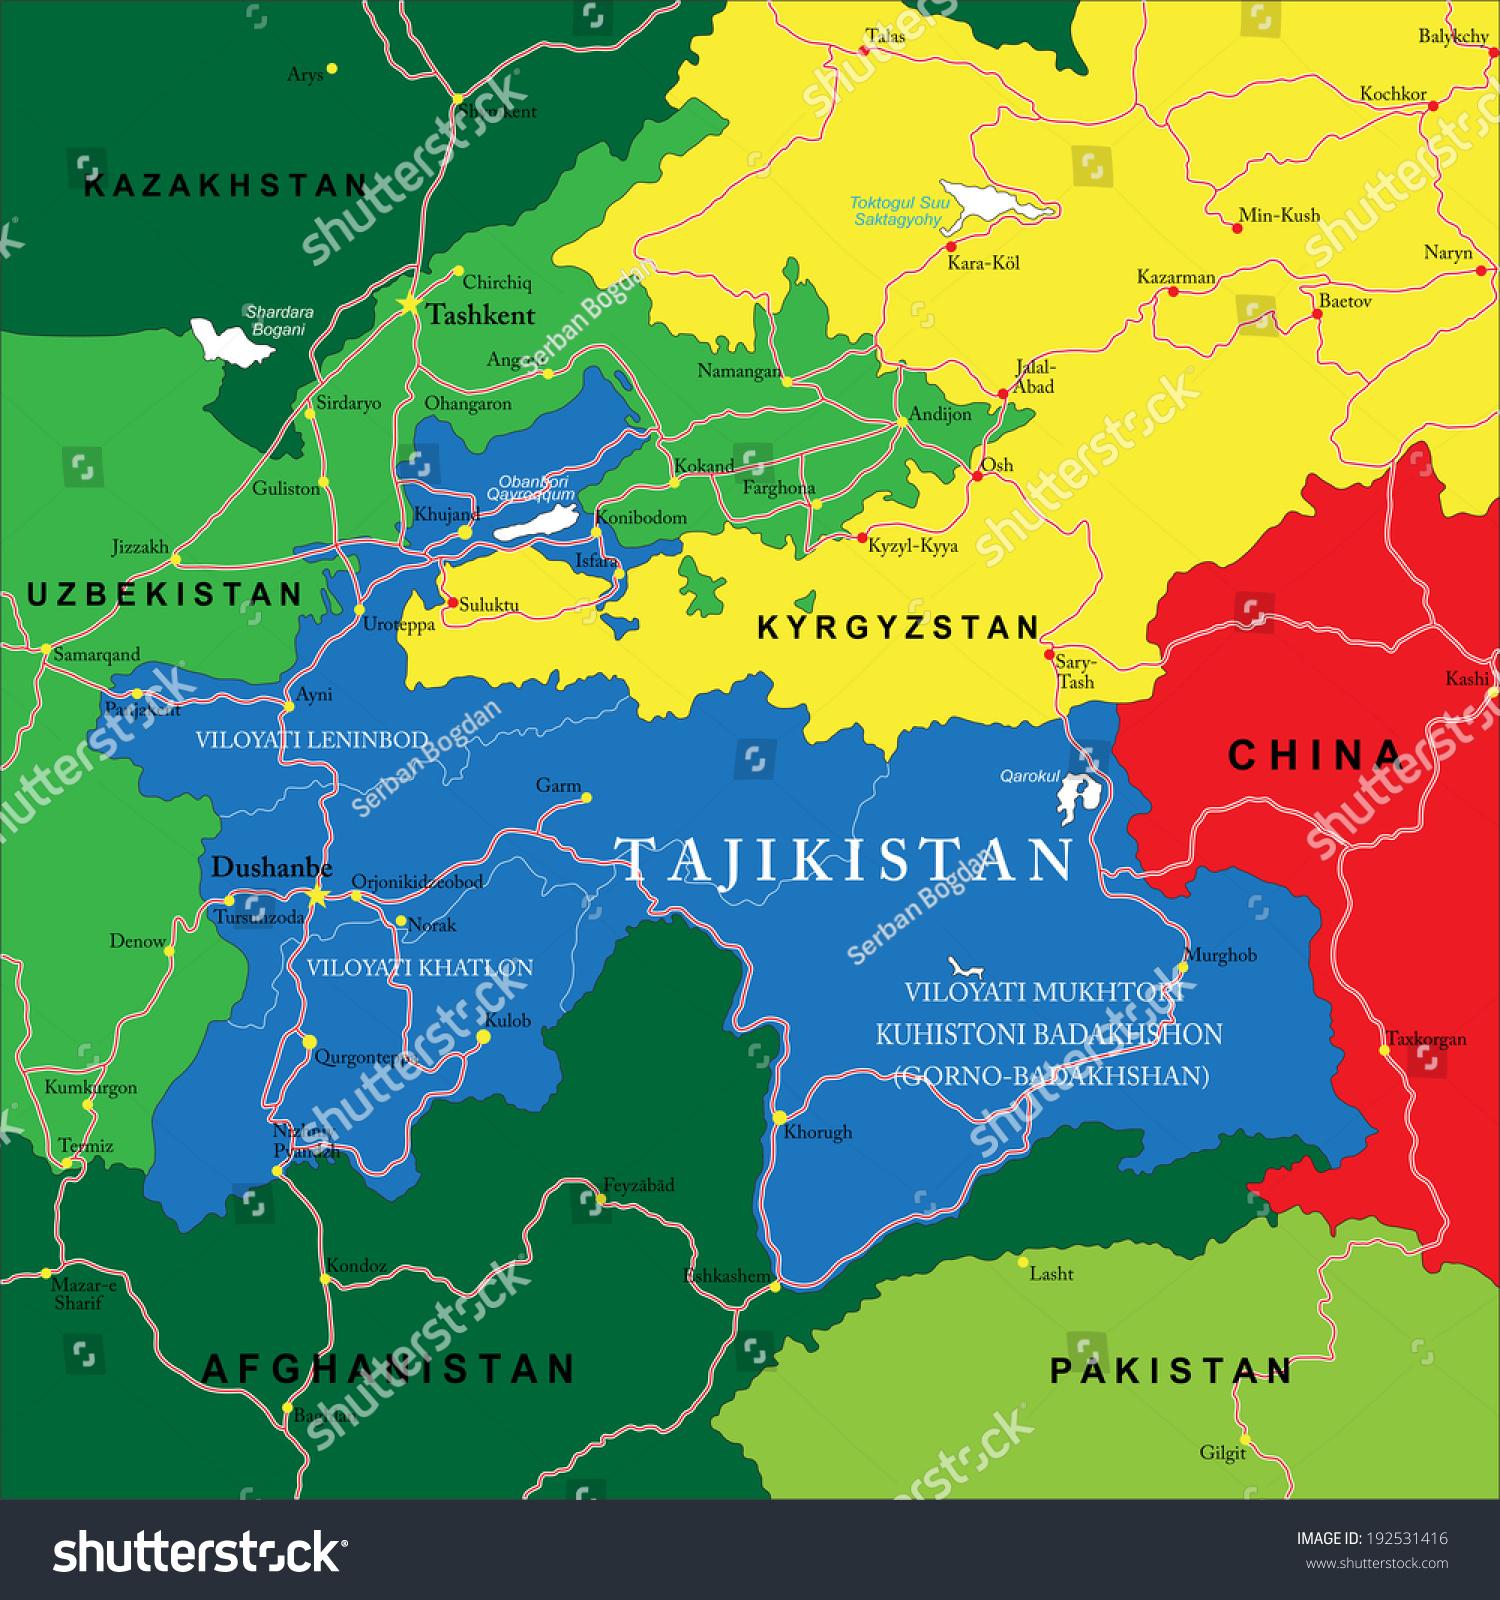 Tajikistan Map Stock Vector Shutterstock - Middle east map dushanbe